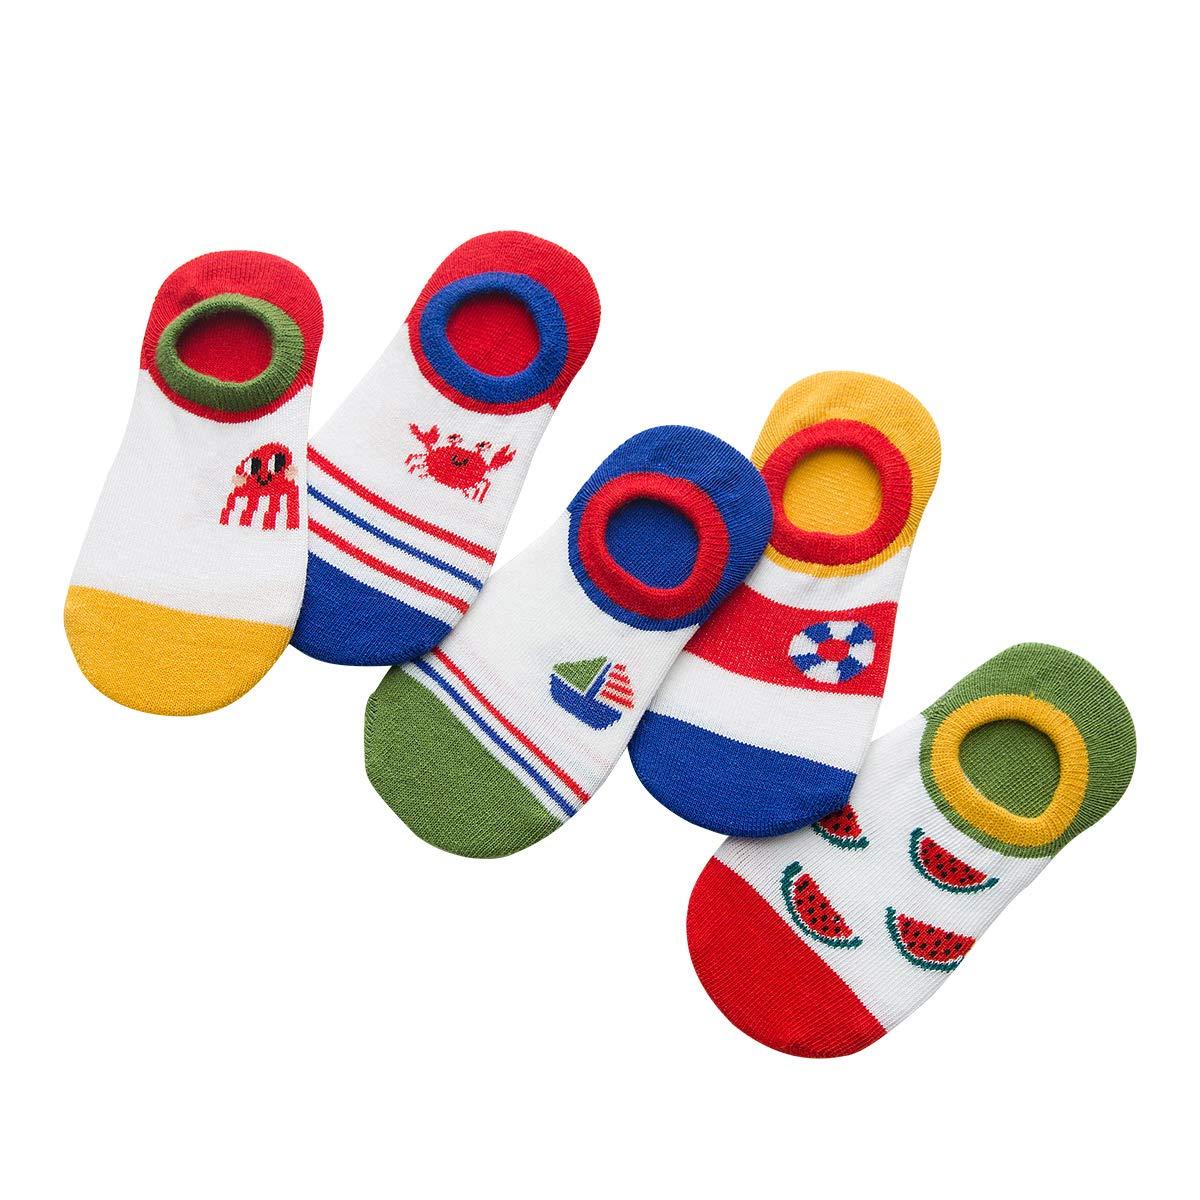 Rallytan Kids Cotton Socks Cartoon Basic No show Socks Flat Boat Line 5 Pair